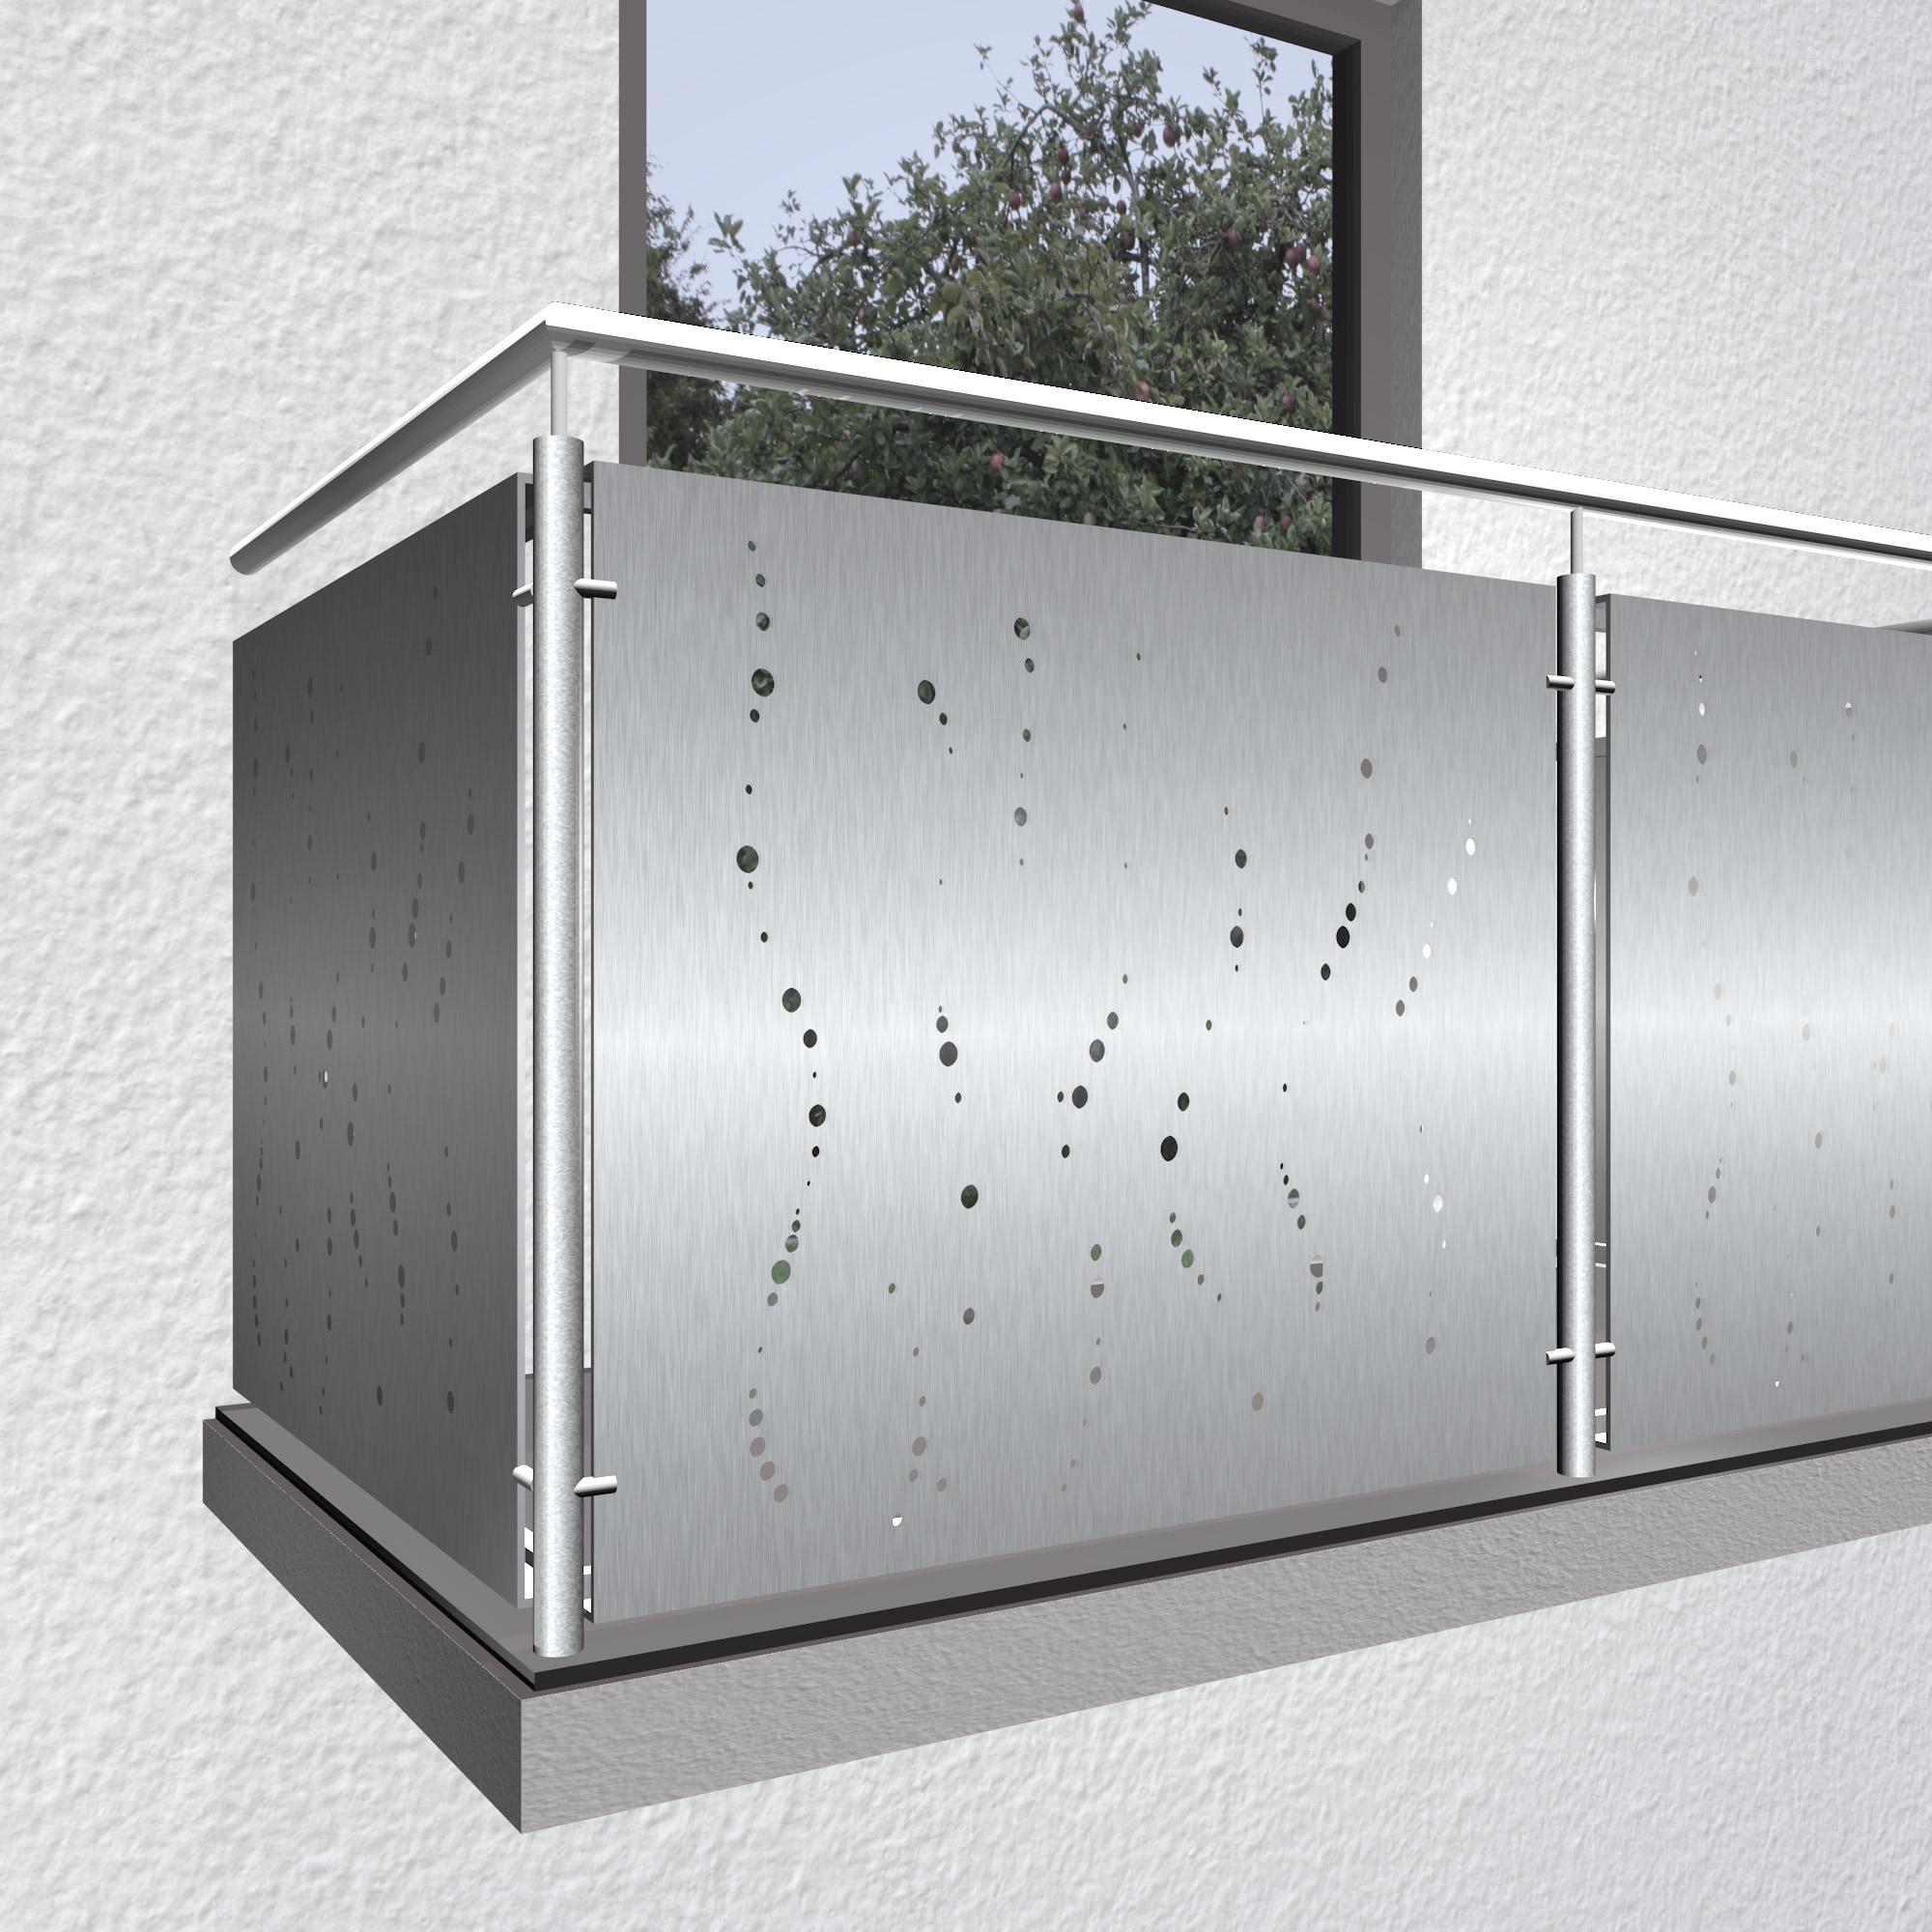 Balkonverkleidung Edelstahl SB